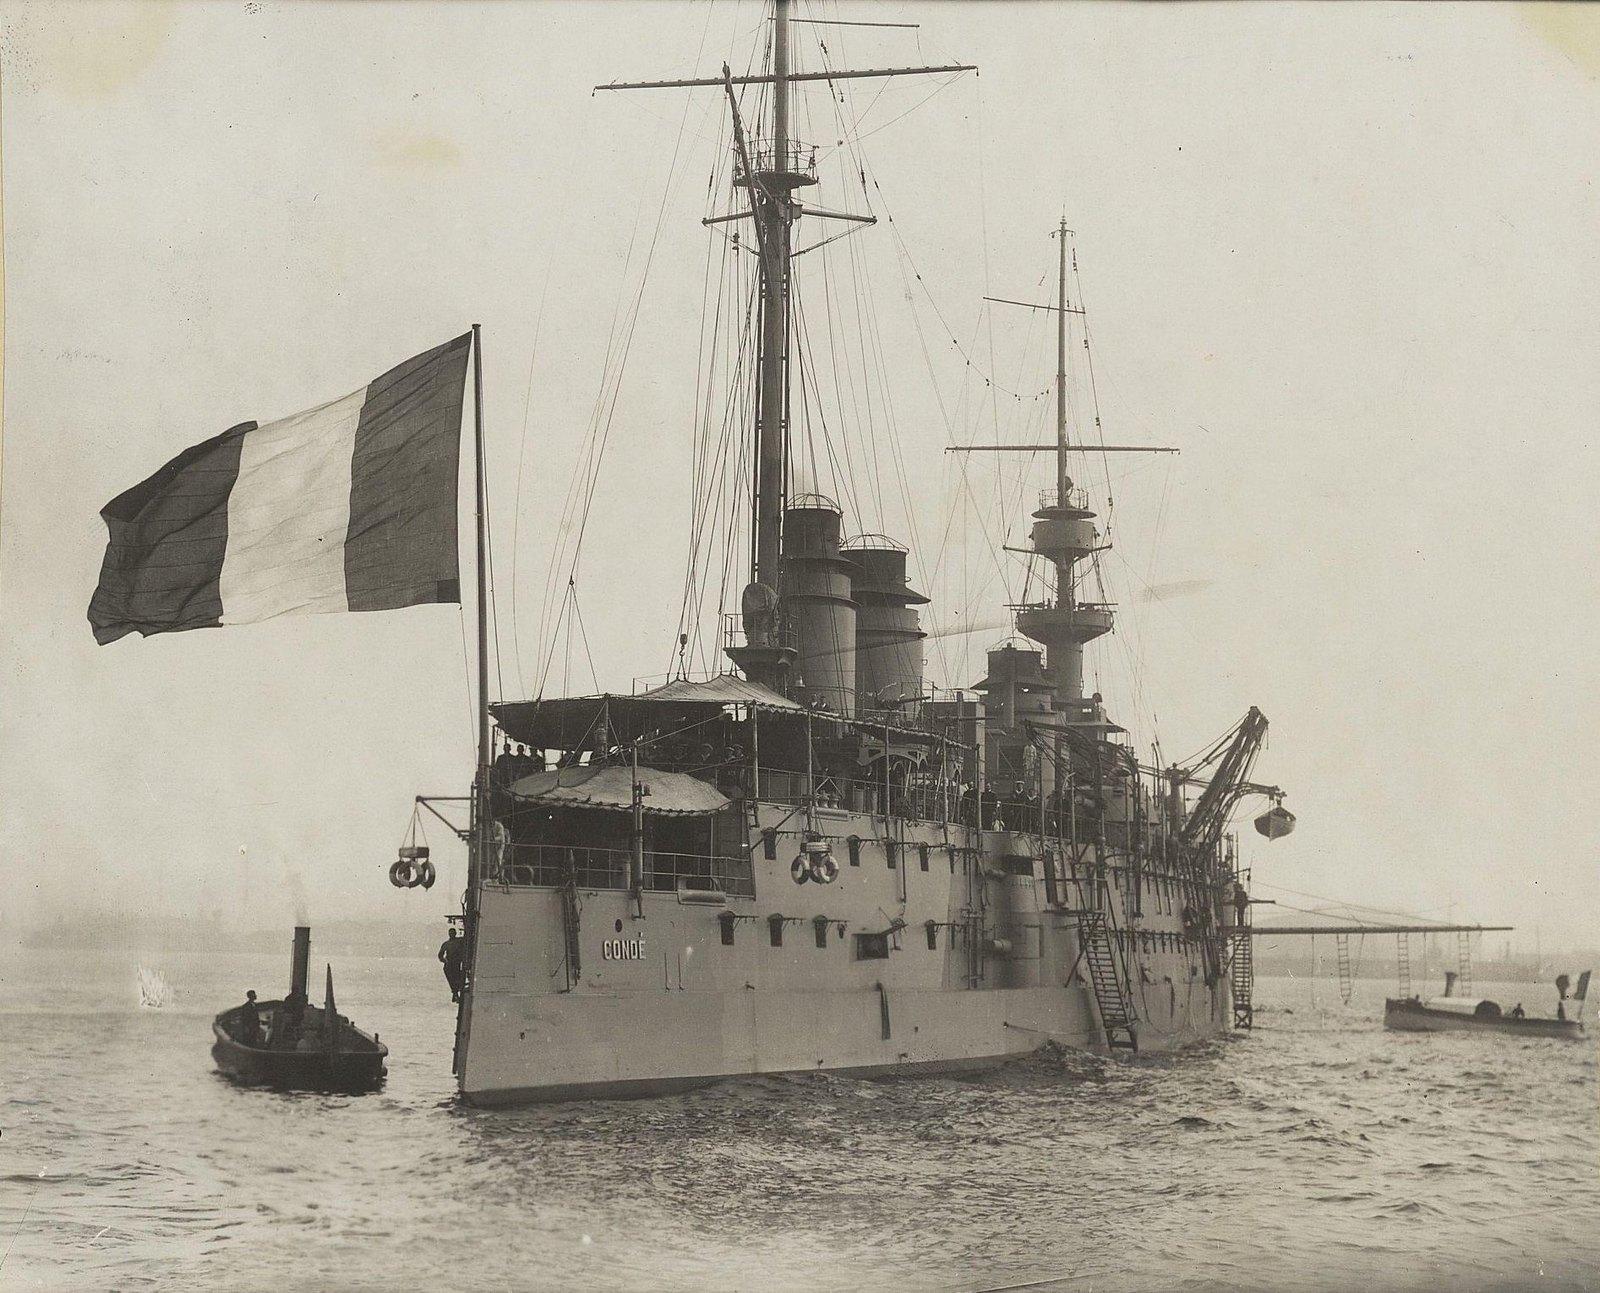 22. Корабль Conde. 1901-1902 гг.